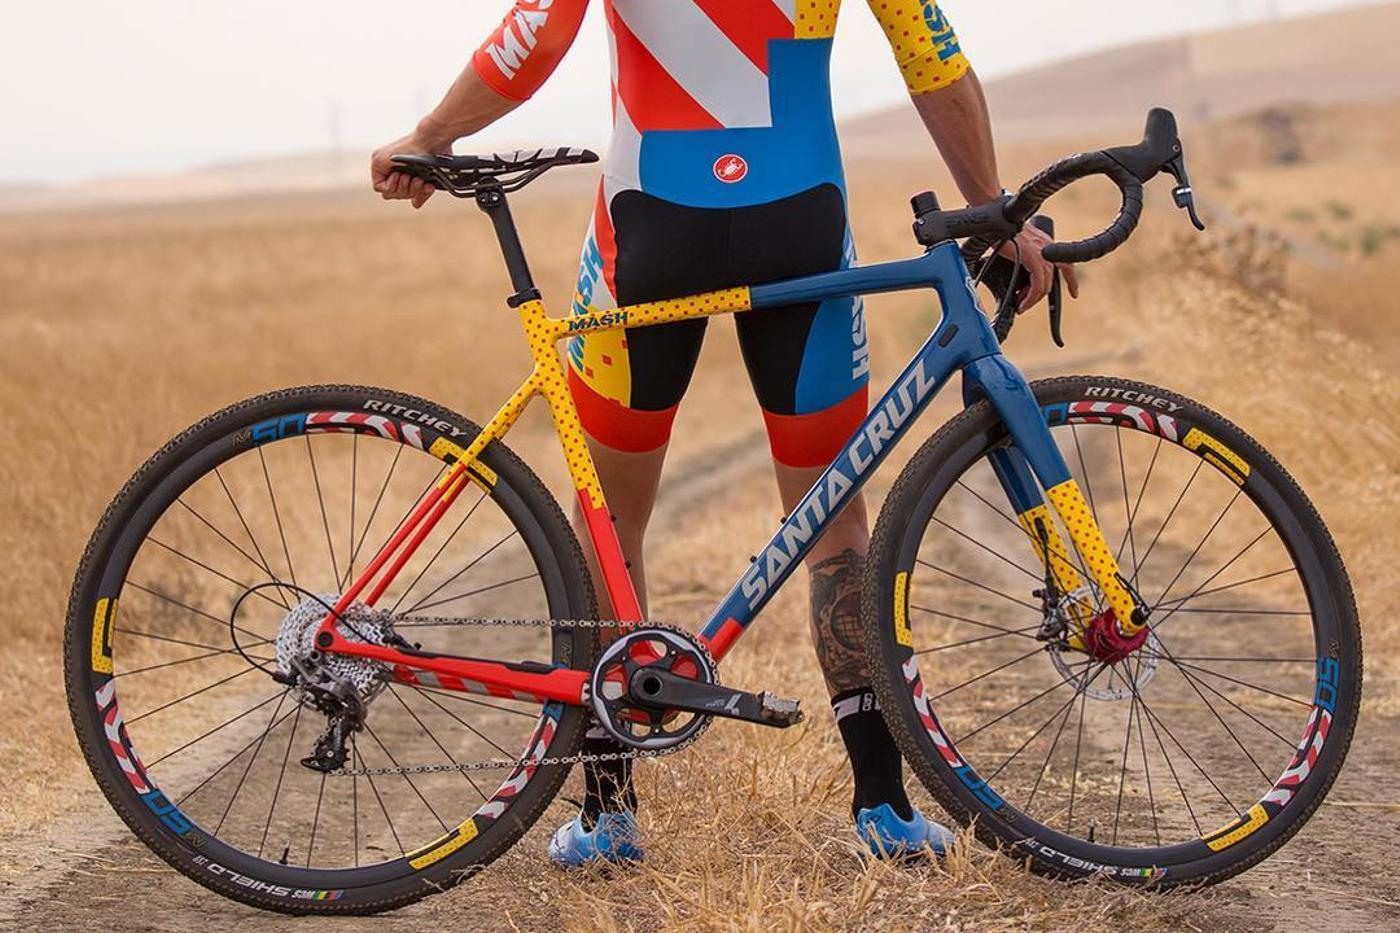 Limited Edition MASH Santa Cruz Bicycles Stigmata Framesets